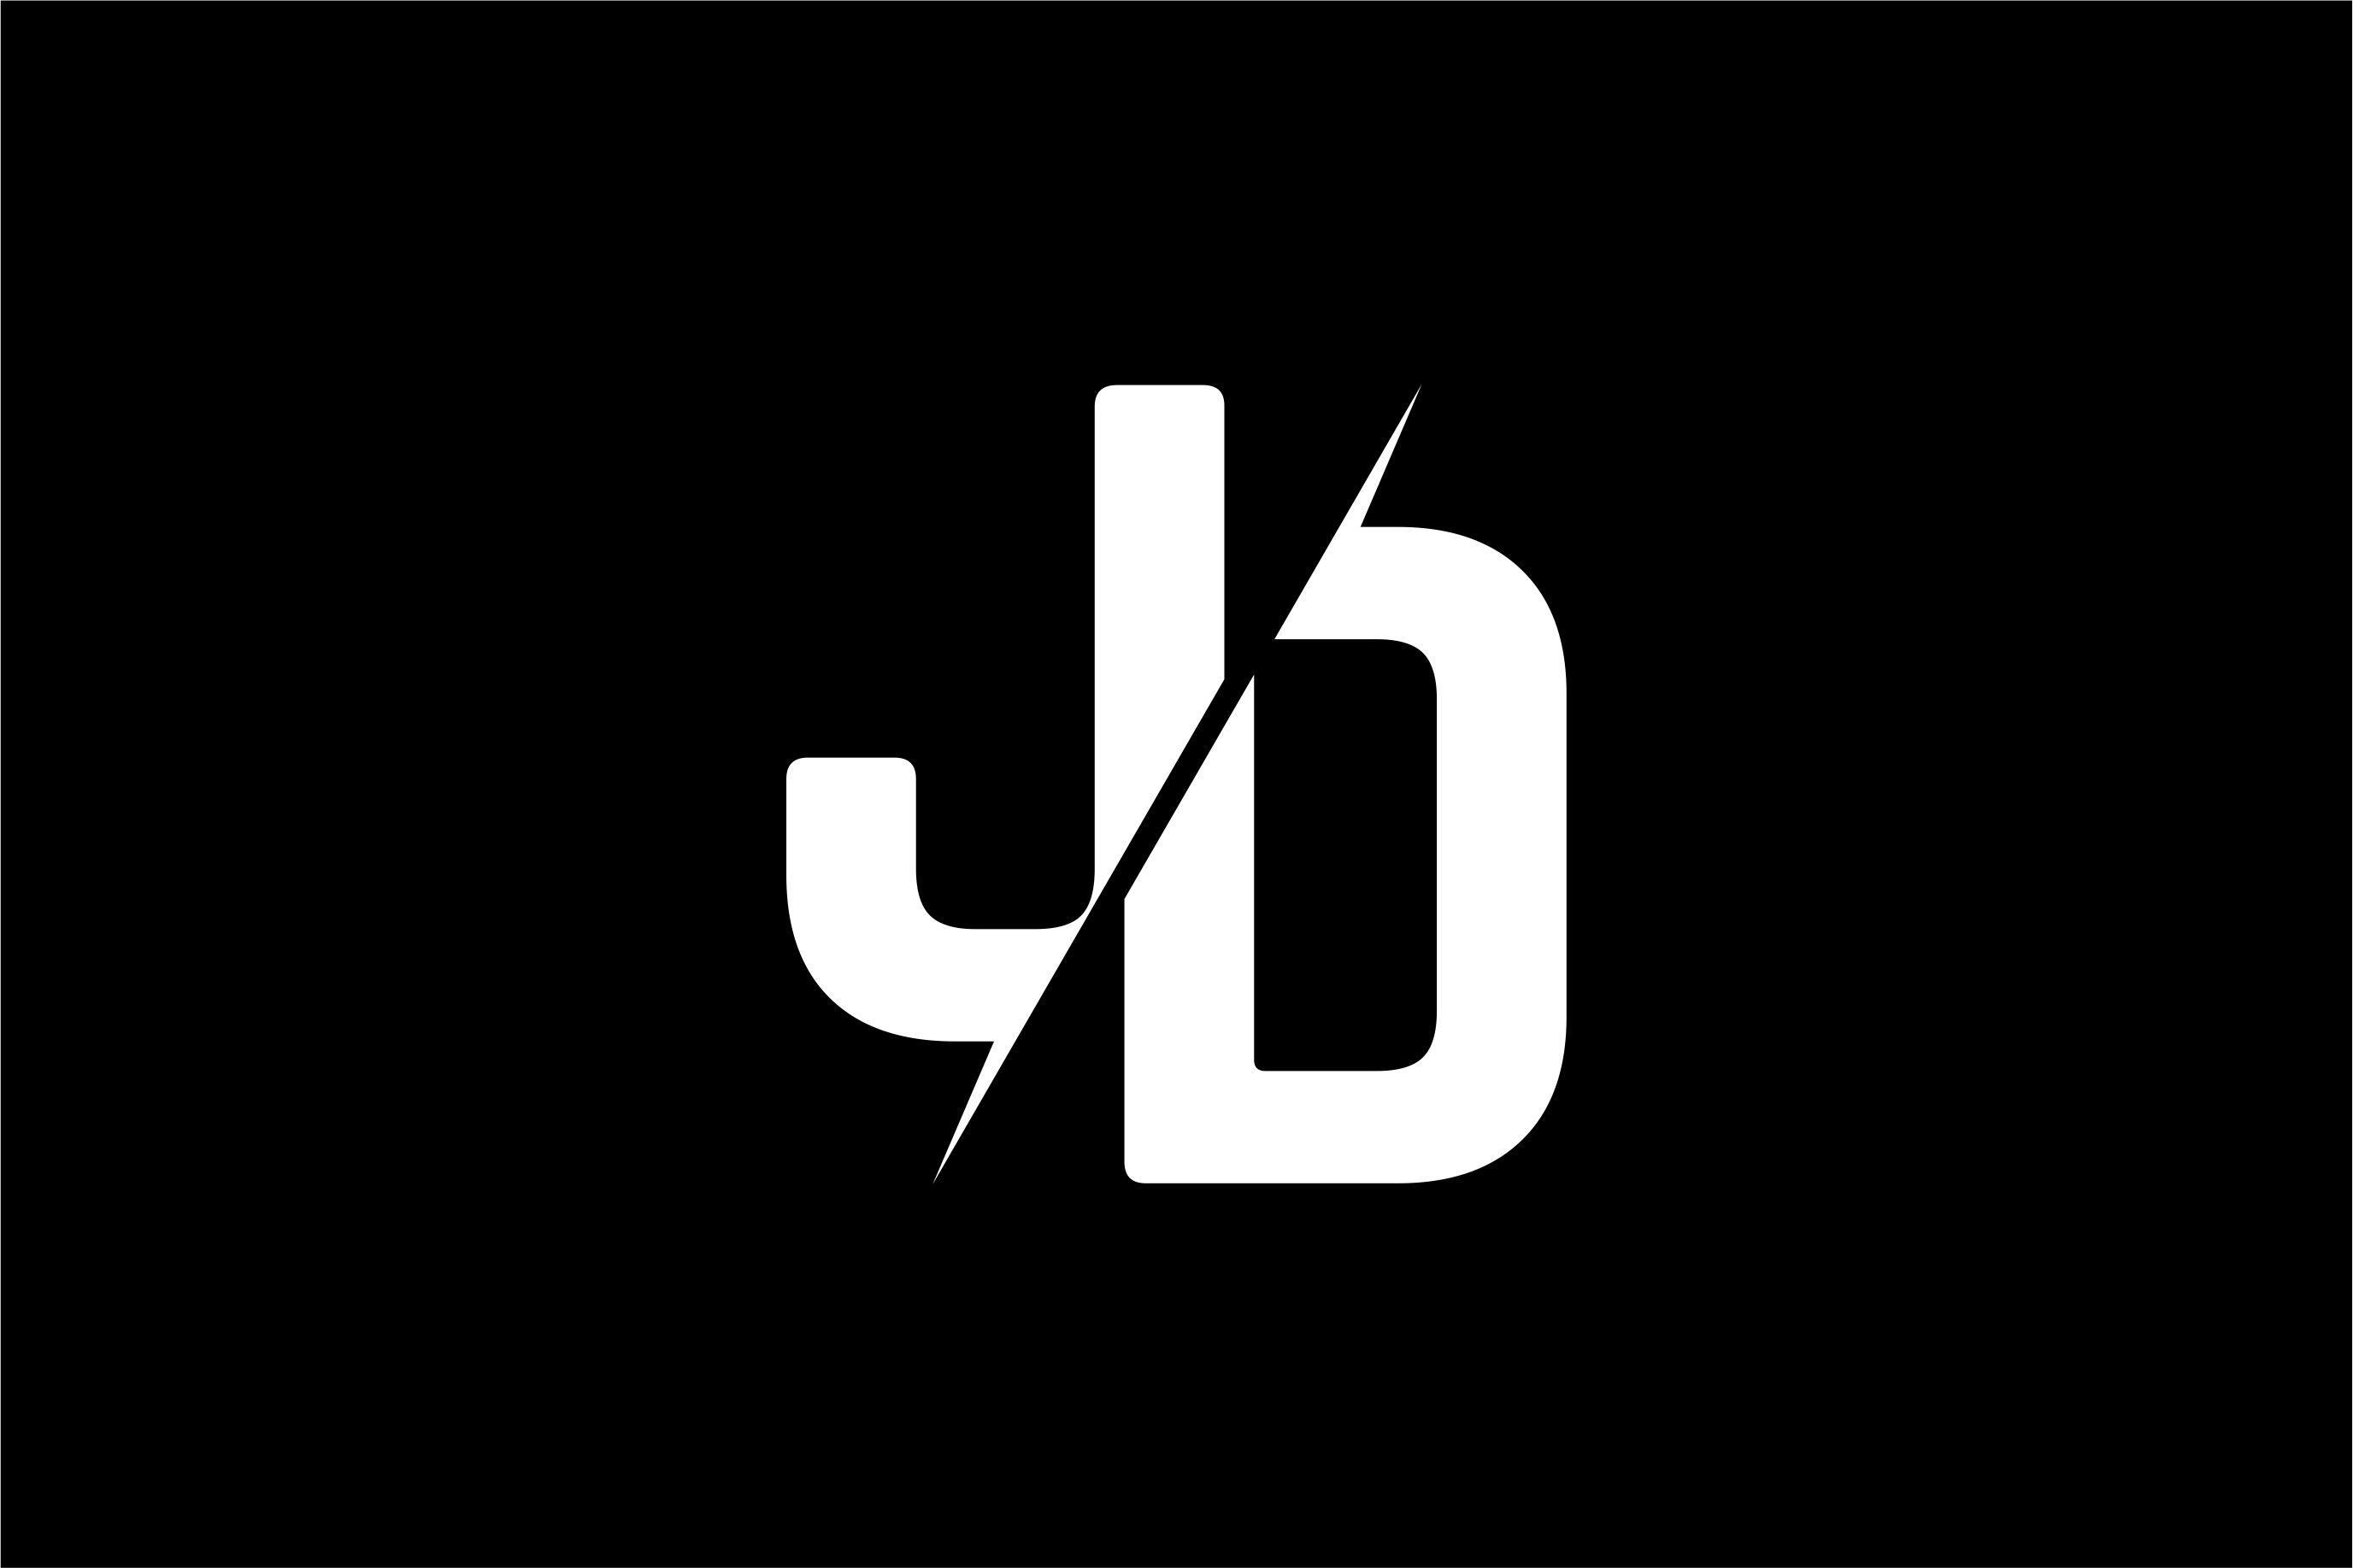 monogram jd logo design graphic by greenlines studios creative fabrica graphic design logo letter logo design logo design monogram jd logo design graphic by